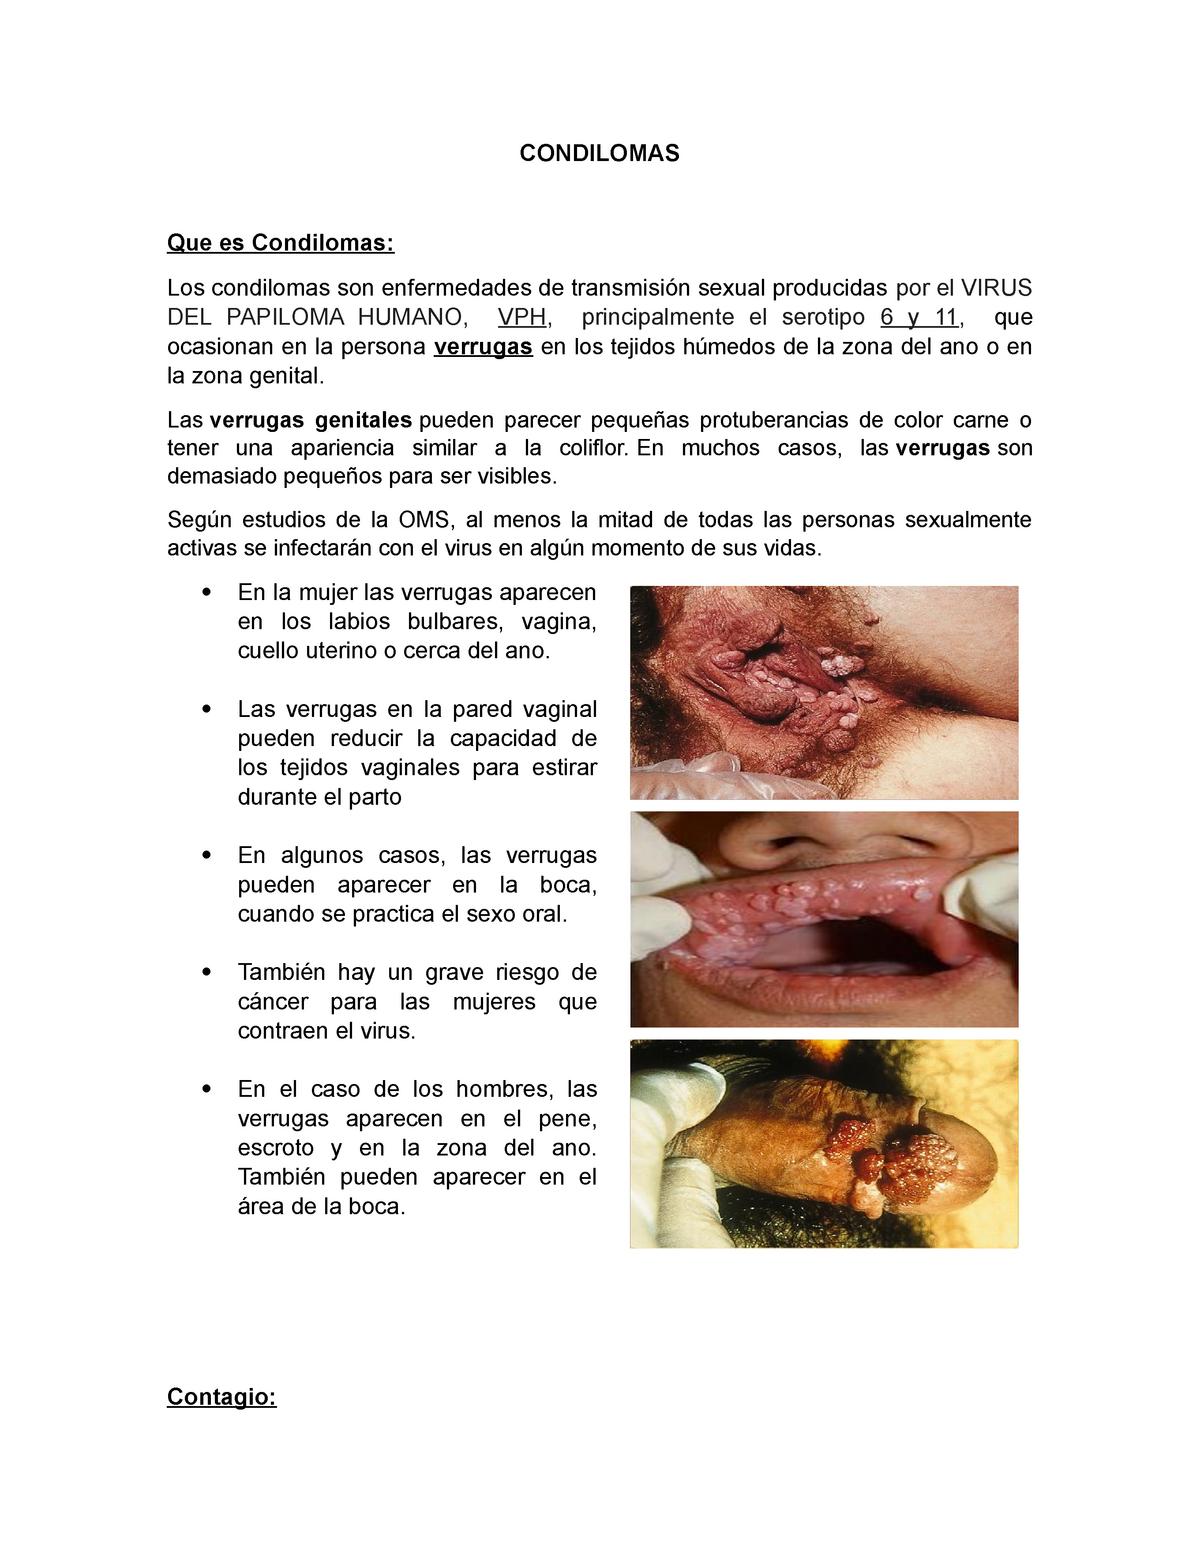 Papiloma humano labios genitales